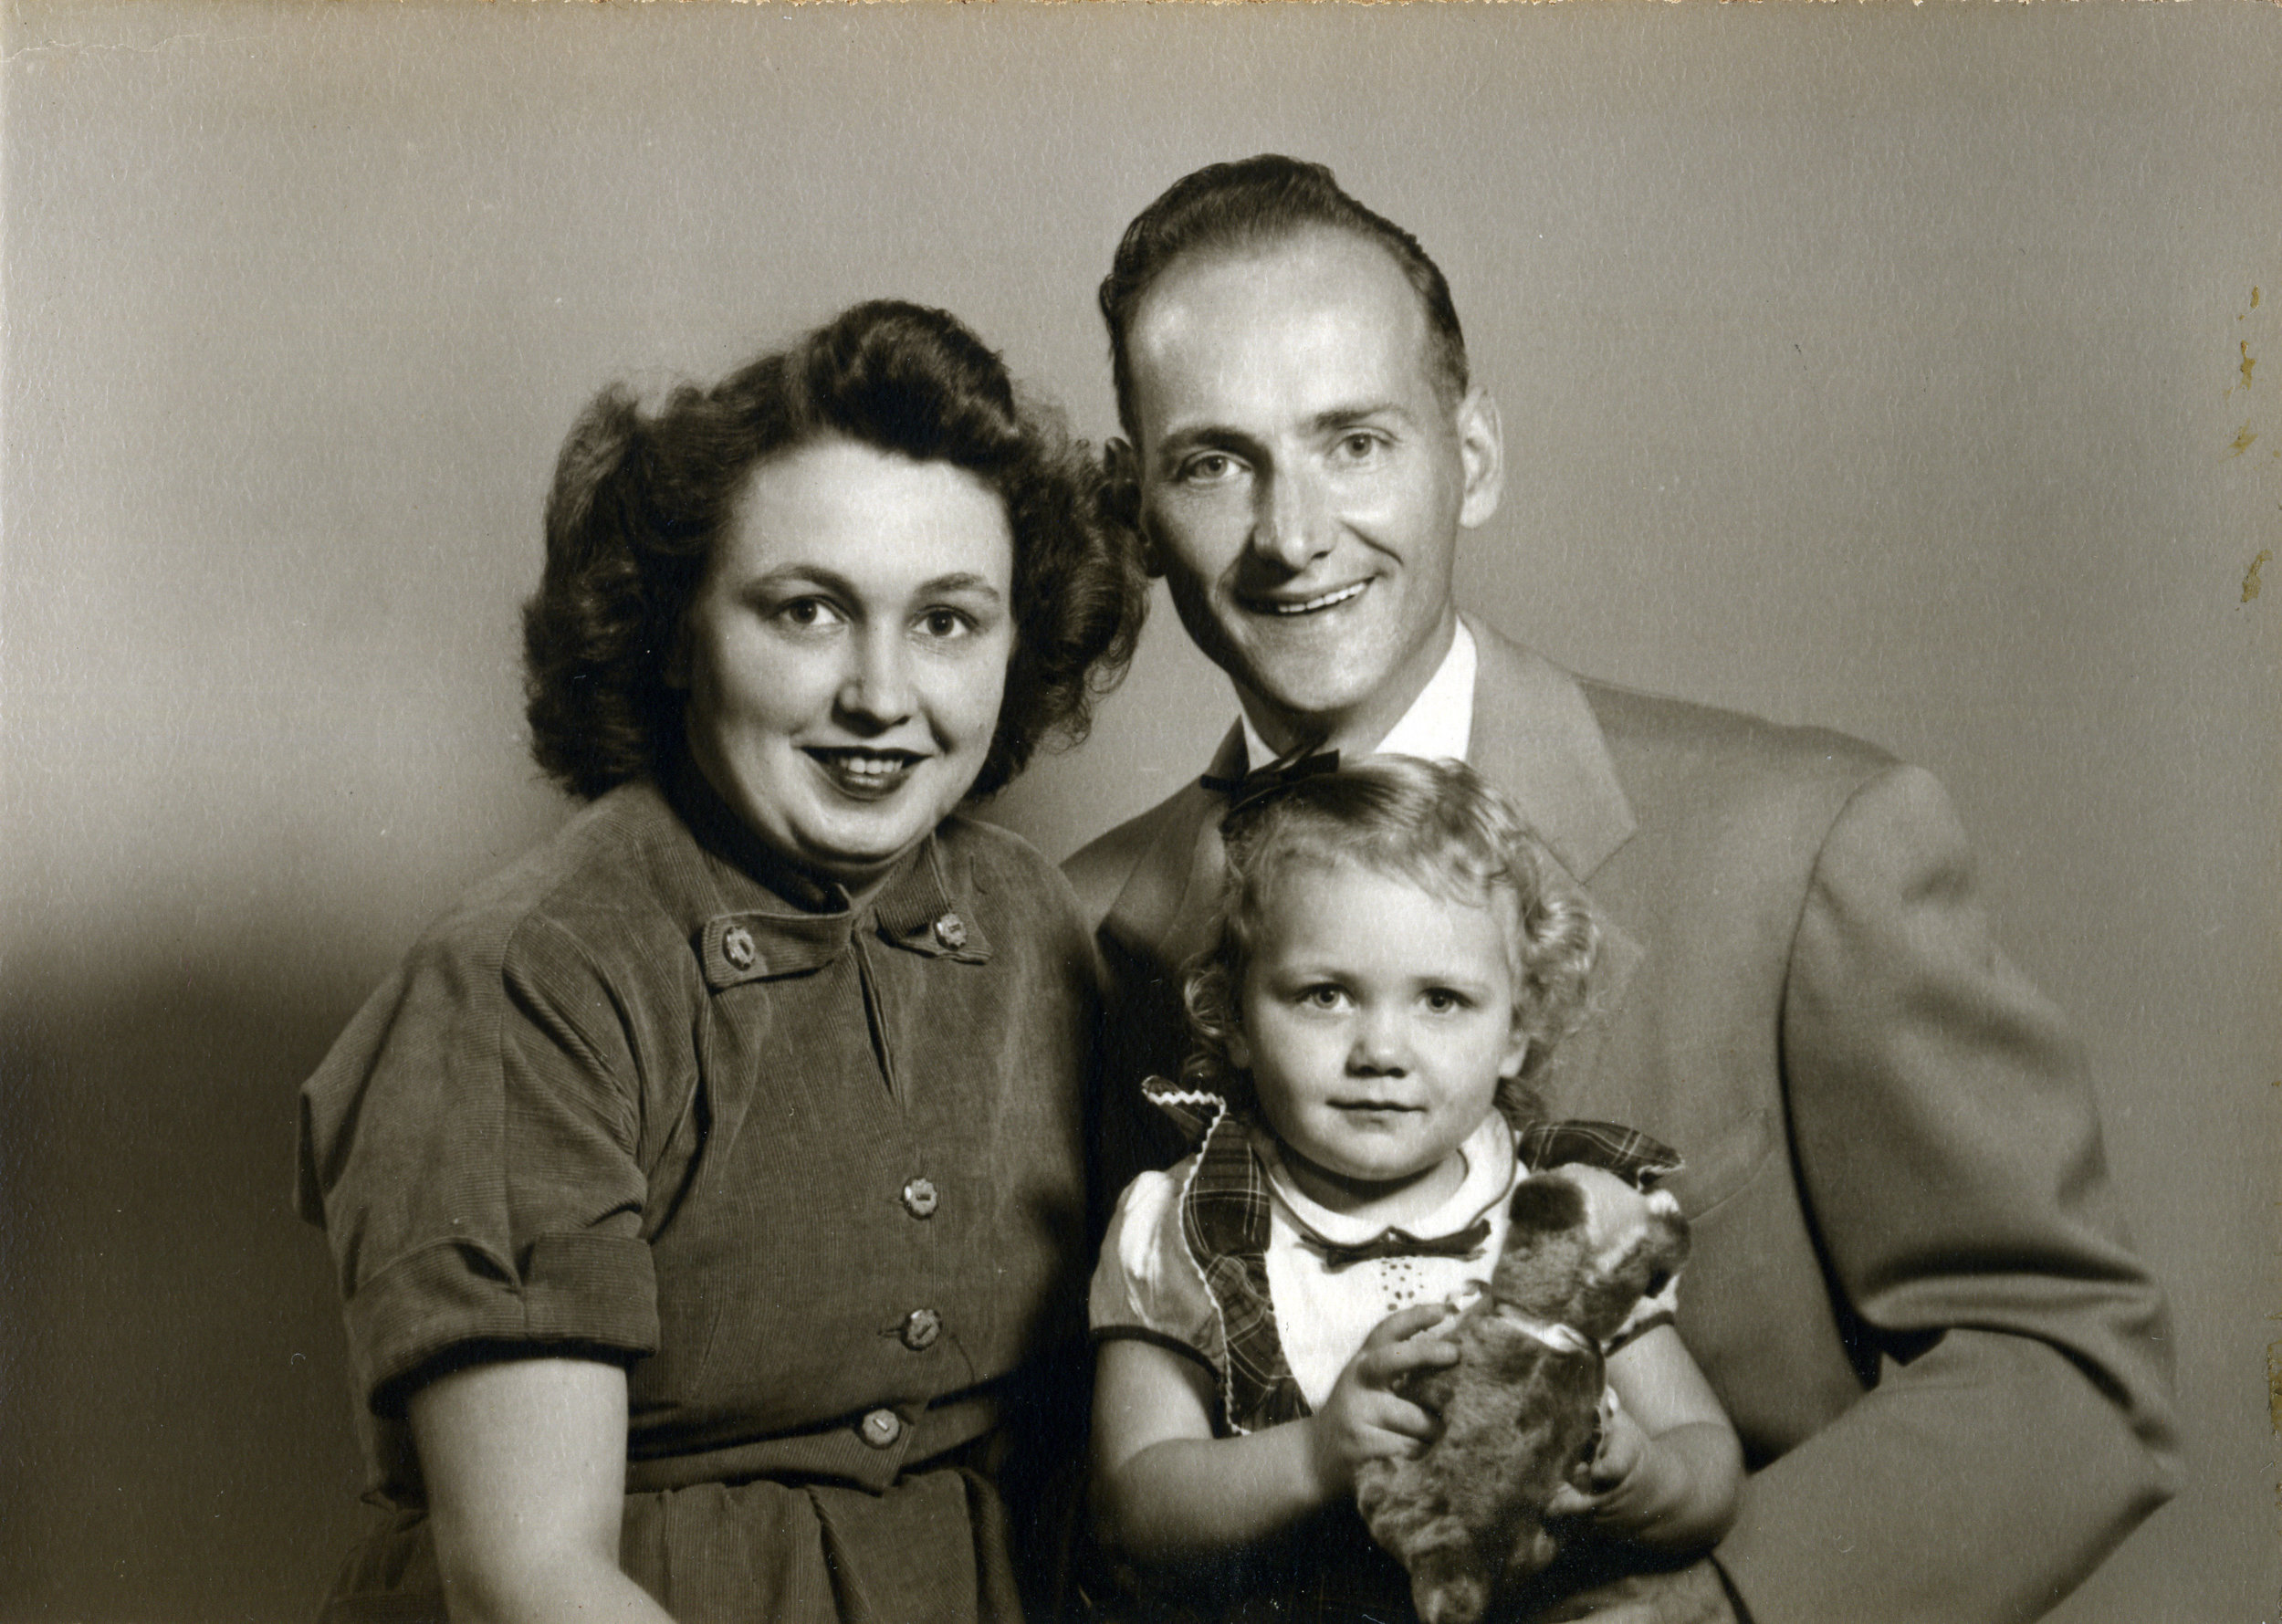 Robert, Geraldine,and Linda, ca. 1949.